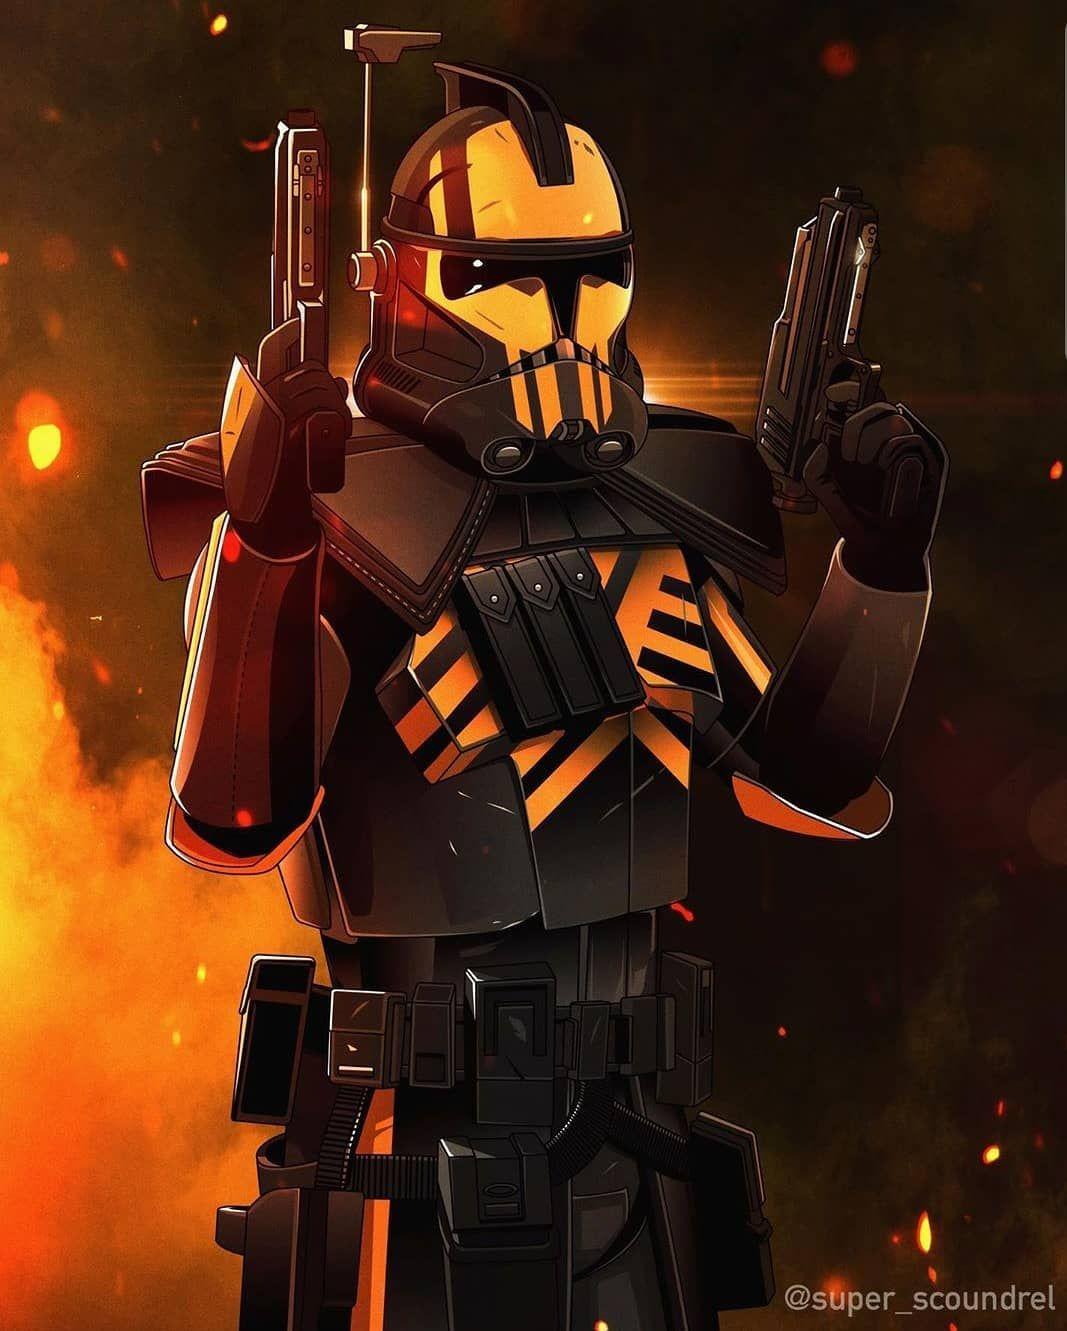 Clone Troopers United On Instagram Arc Trooper Battlefront Skin Art By Super Scoundrel Clonetr In 2020 Star Wars Wallpaper Star Wars Background Star Wars Images